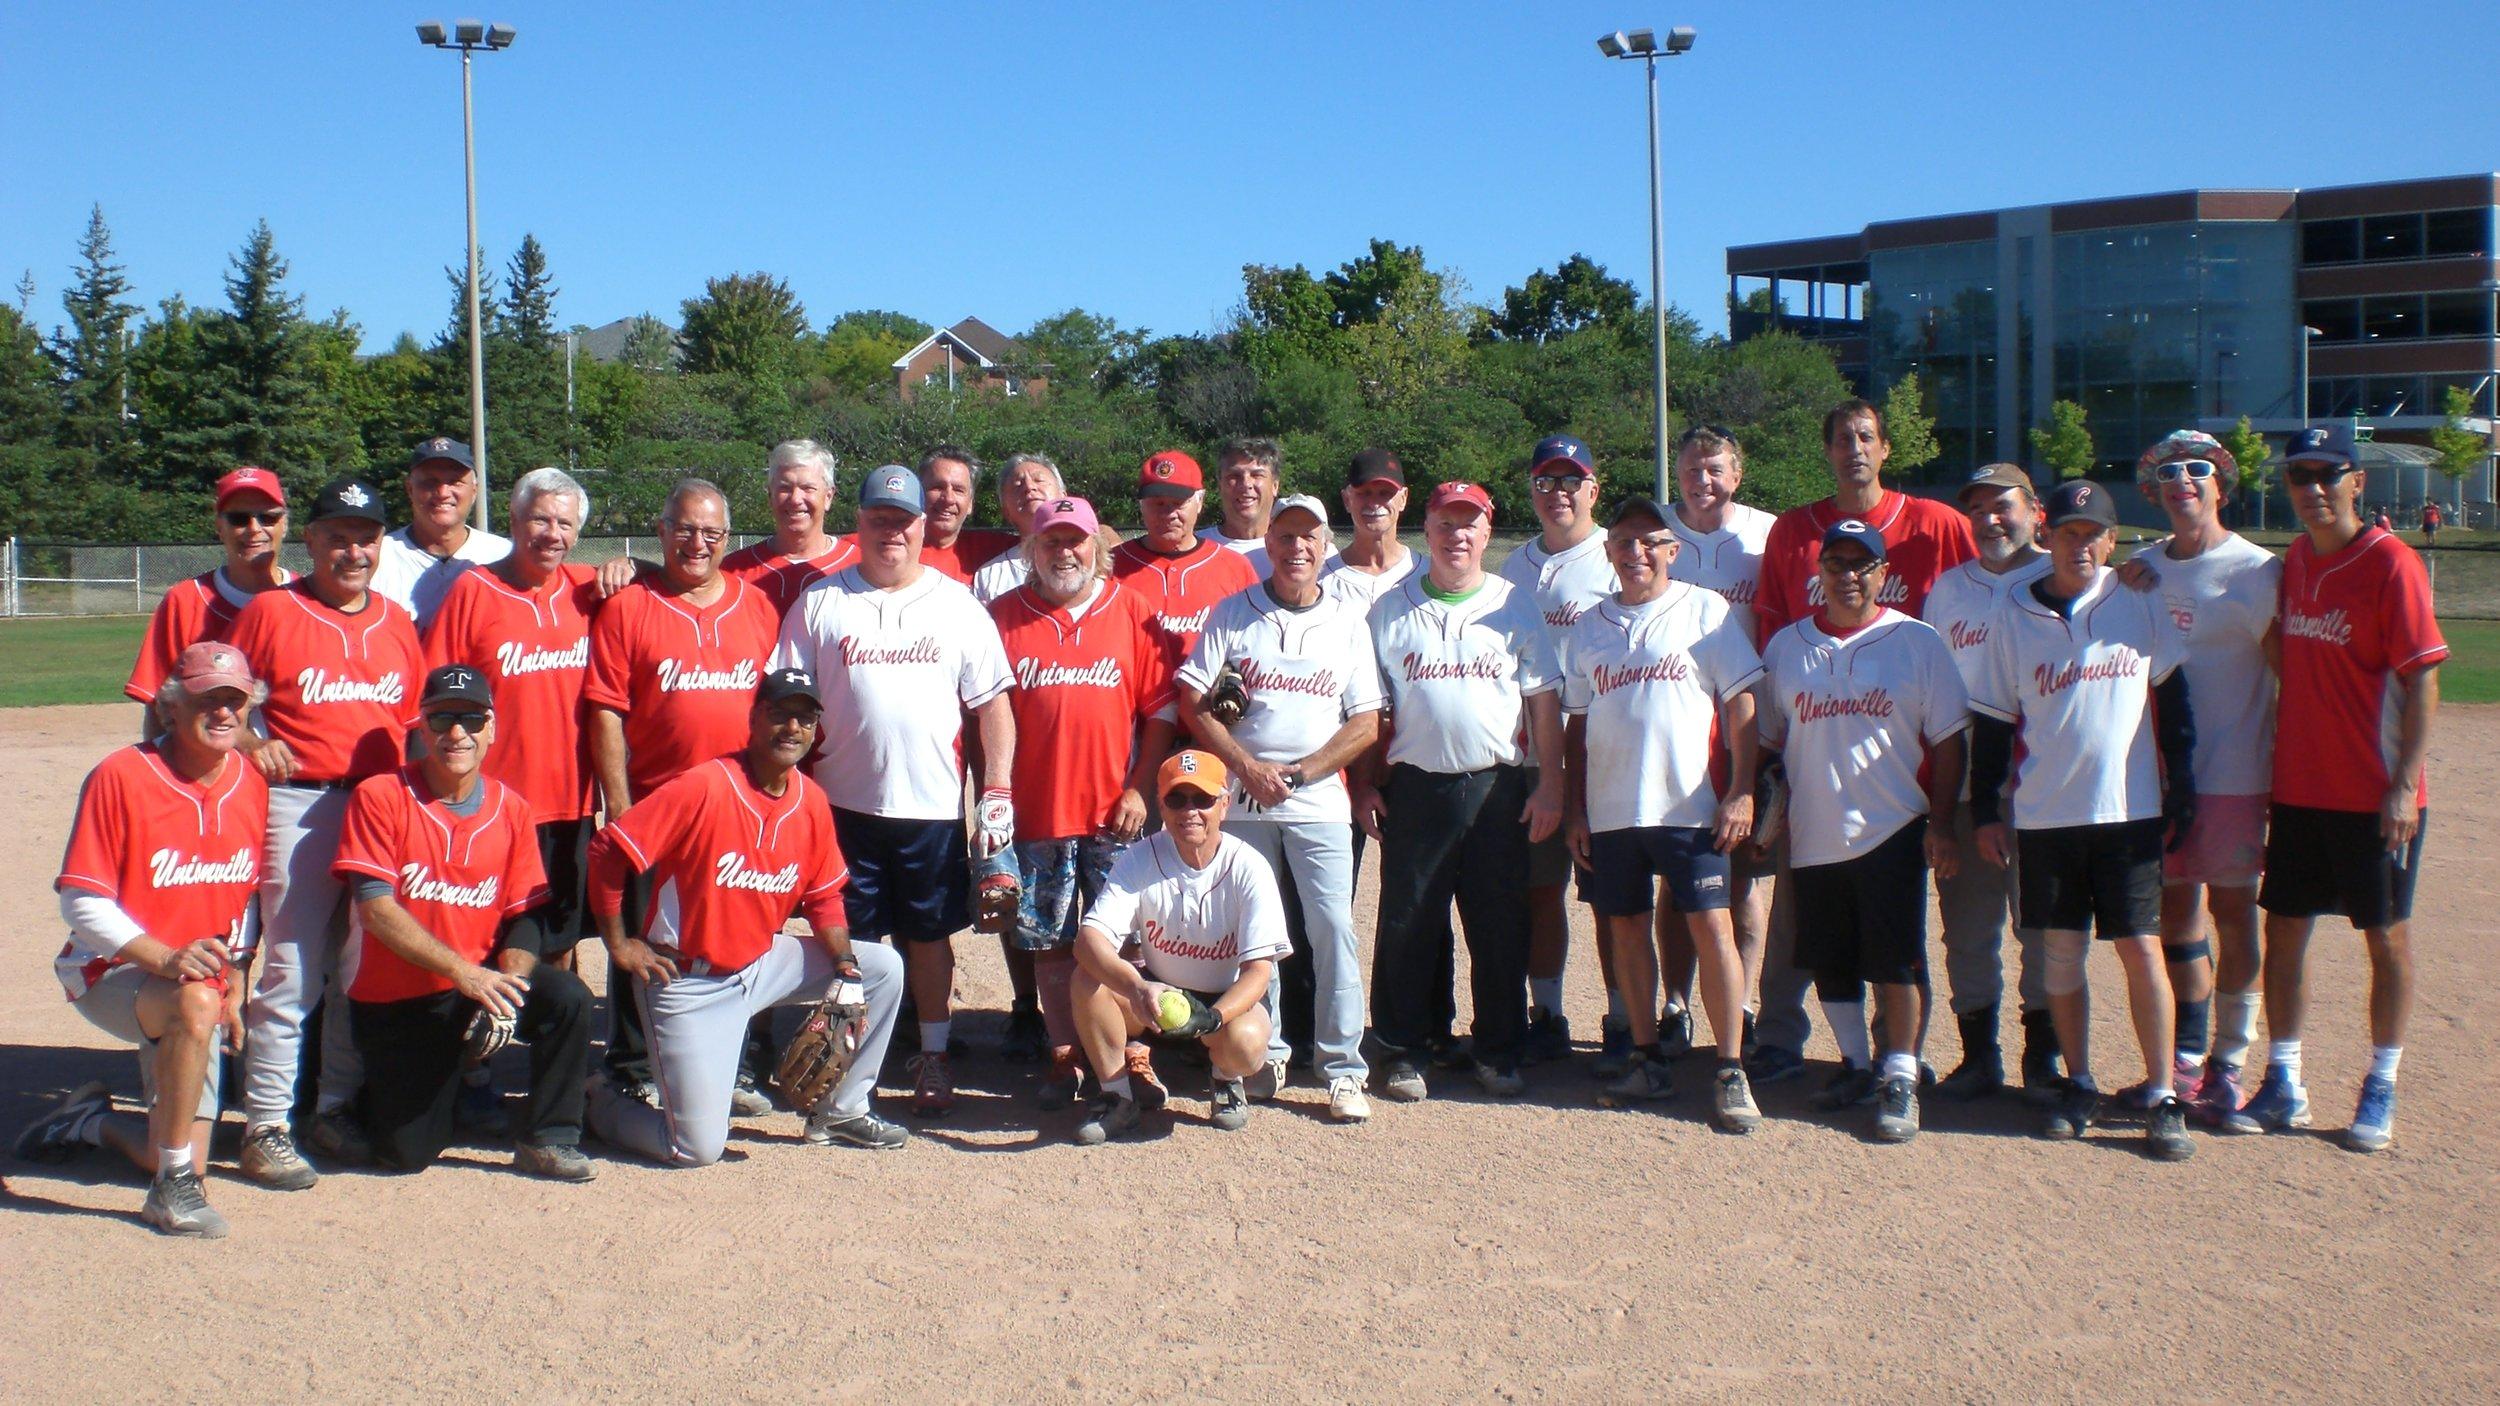 The MAC Team - Men's Senior Slo-Pitch Baseball Markham